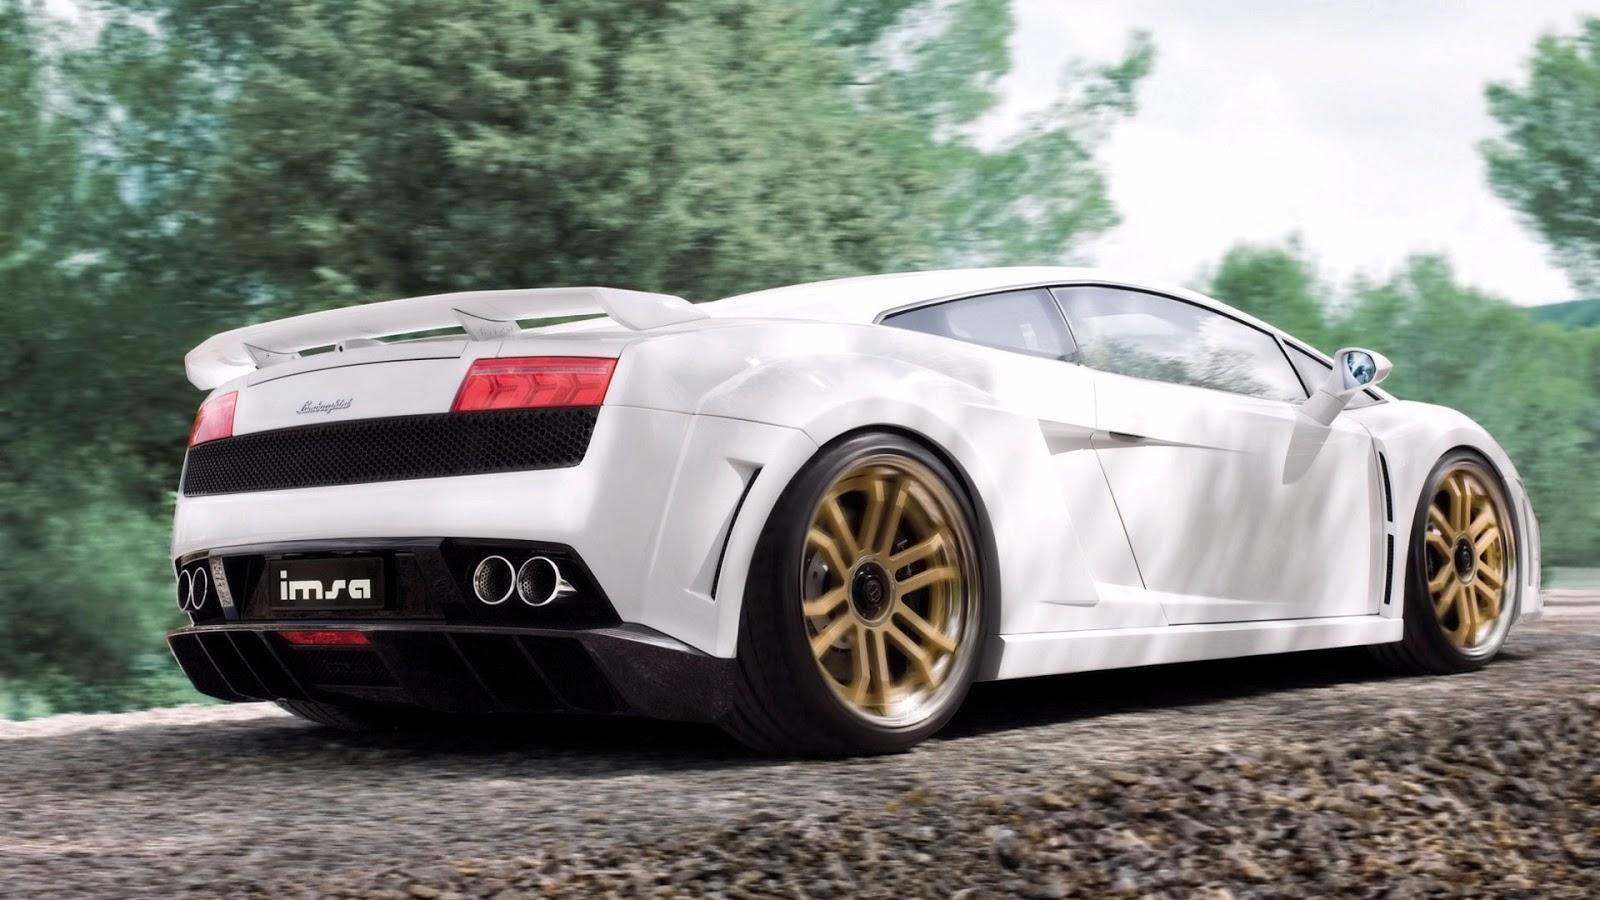 Lamborghini Gallardo White Wallpapers HD